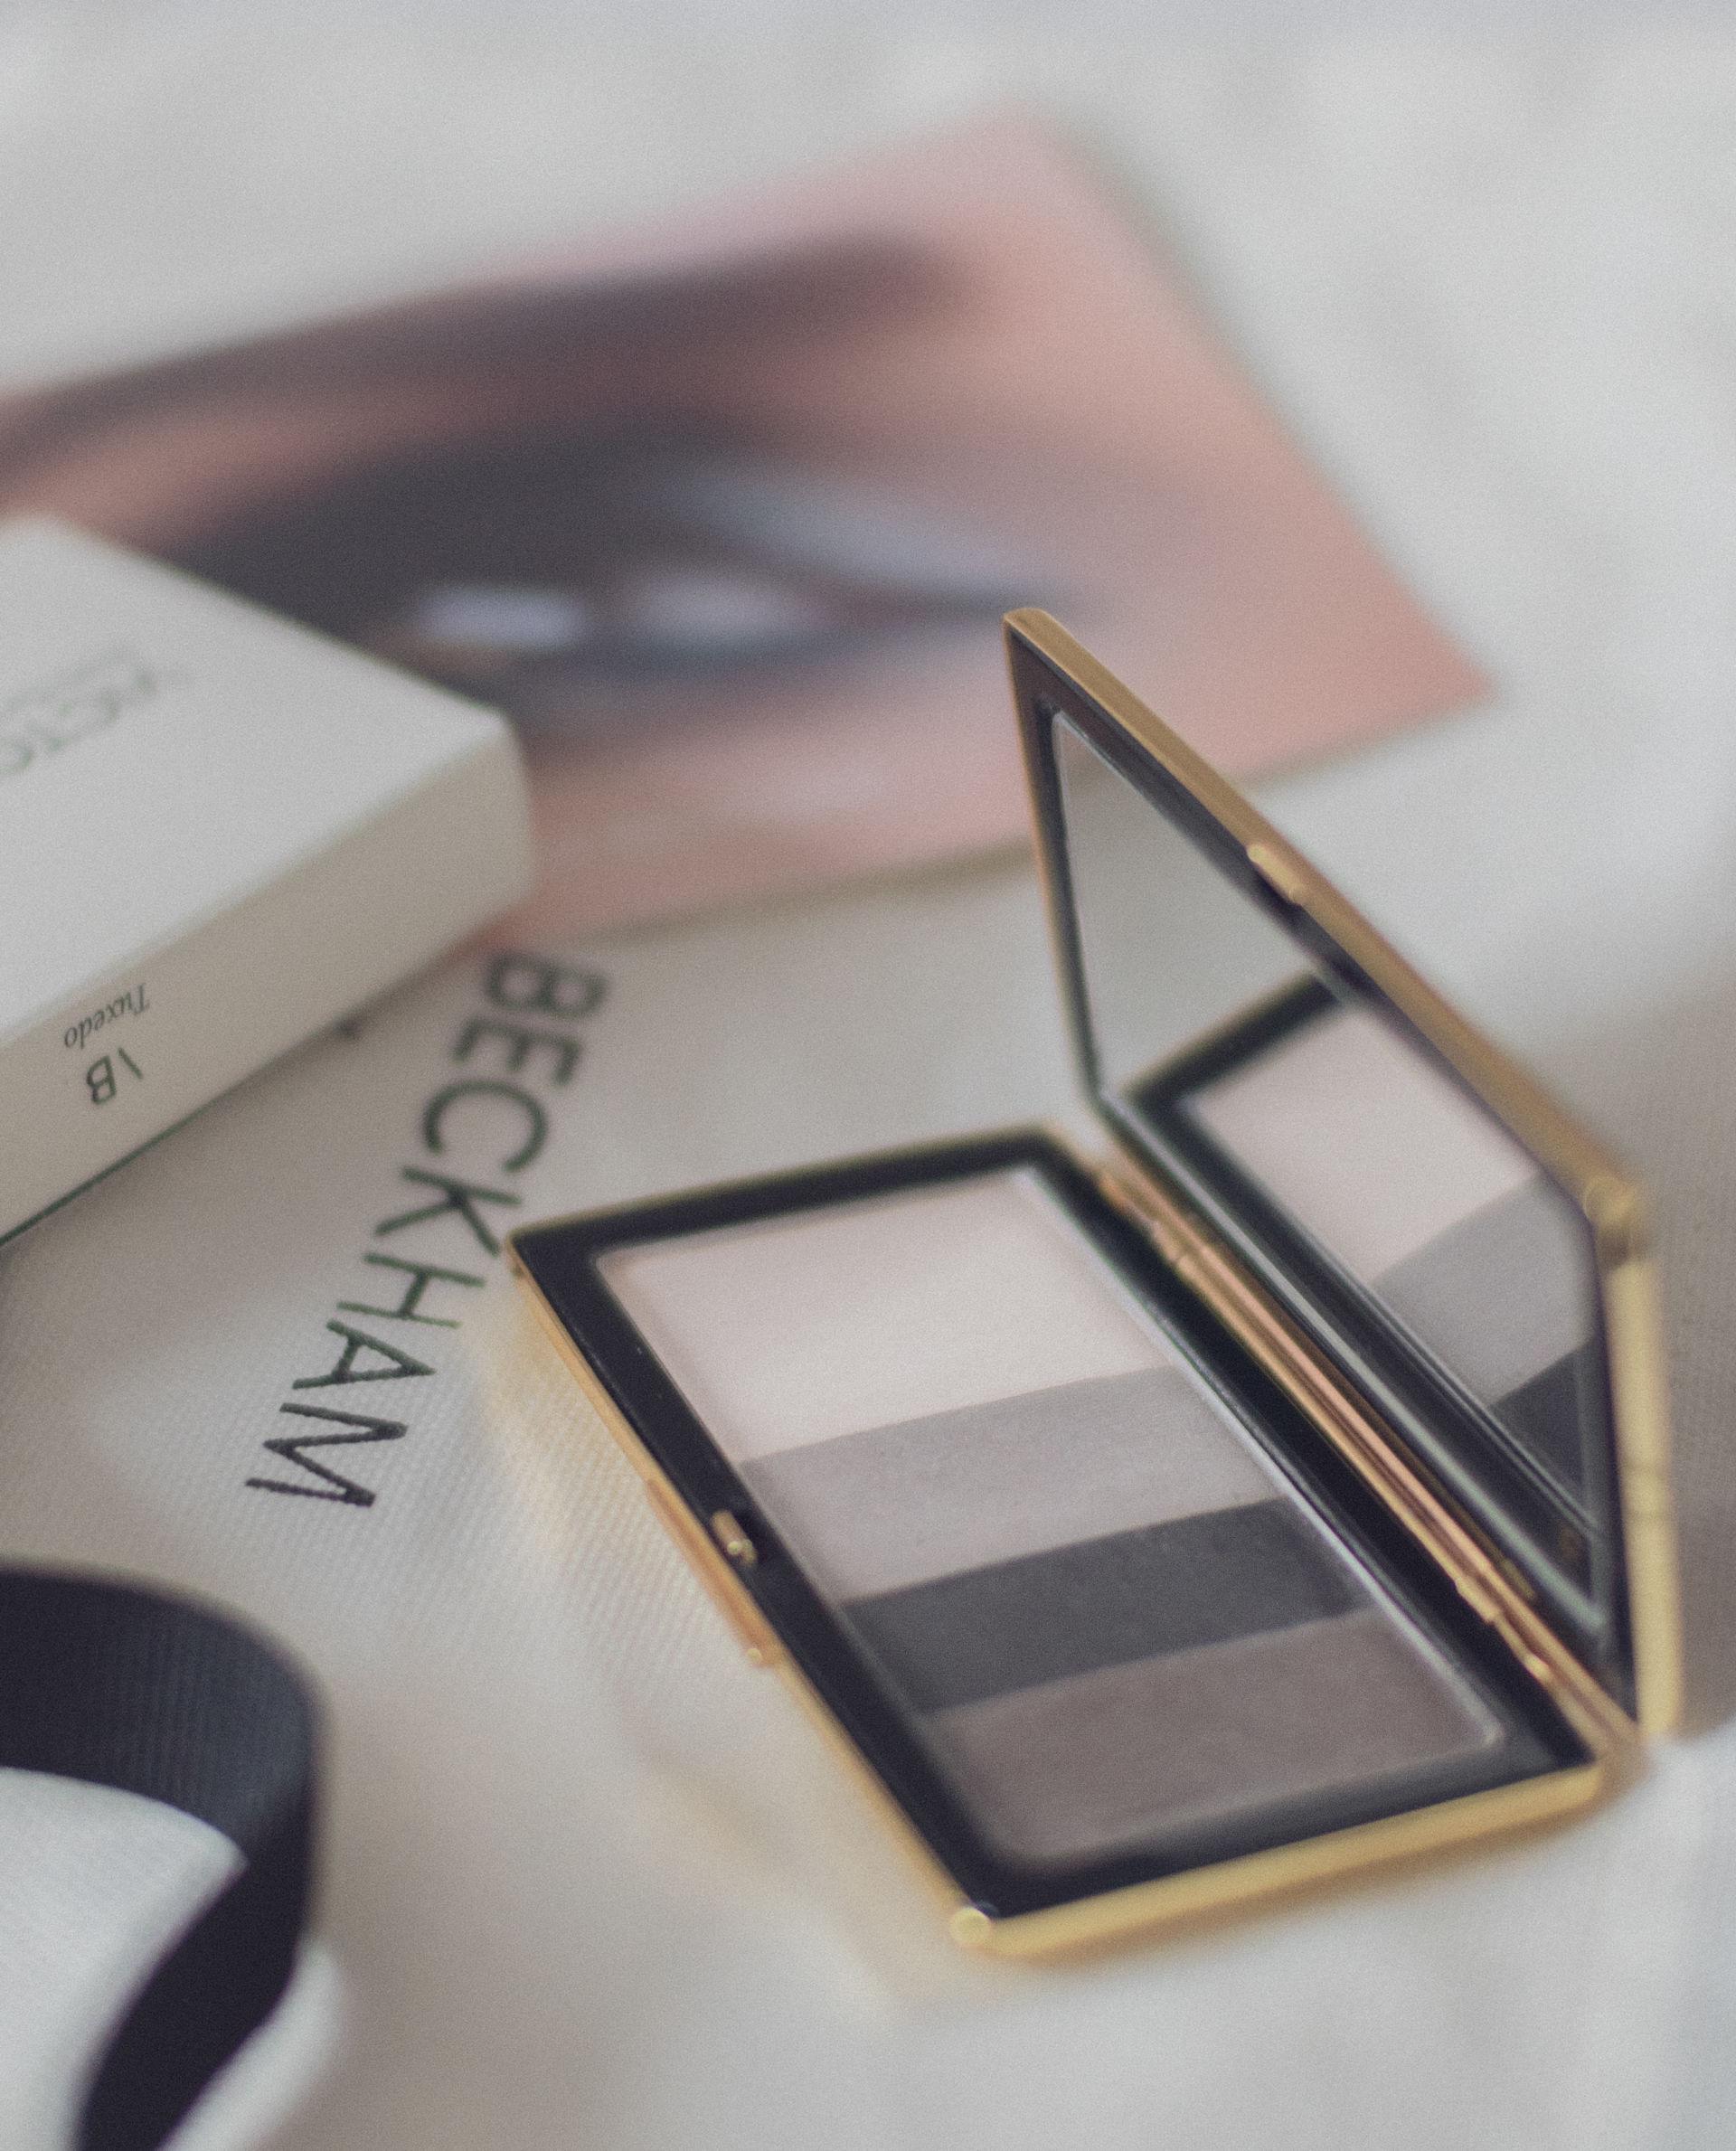 VB Beauty Tuxedo Eyeshadow Palette